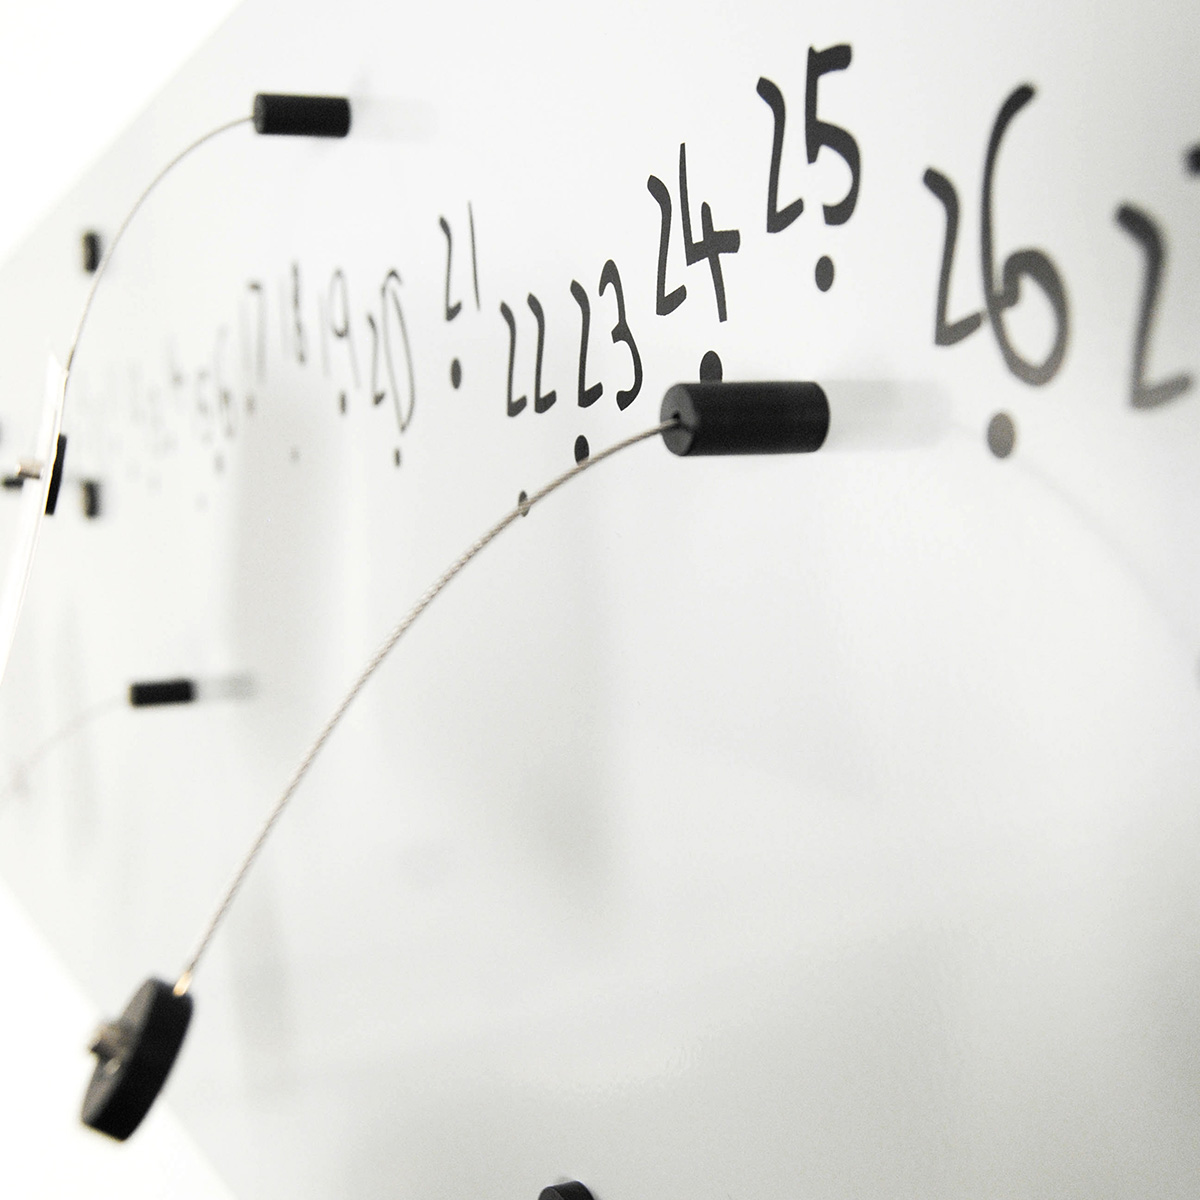 calendario-perpetuo-lavagna-magnetica-perpetual-calendar-magnetic-board-design-detail-kro2-white